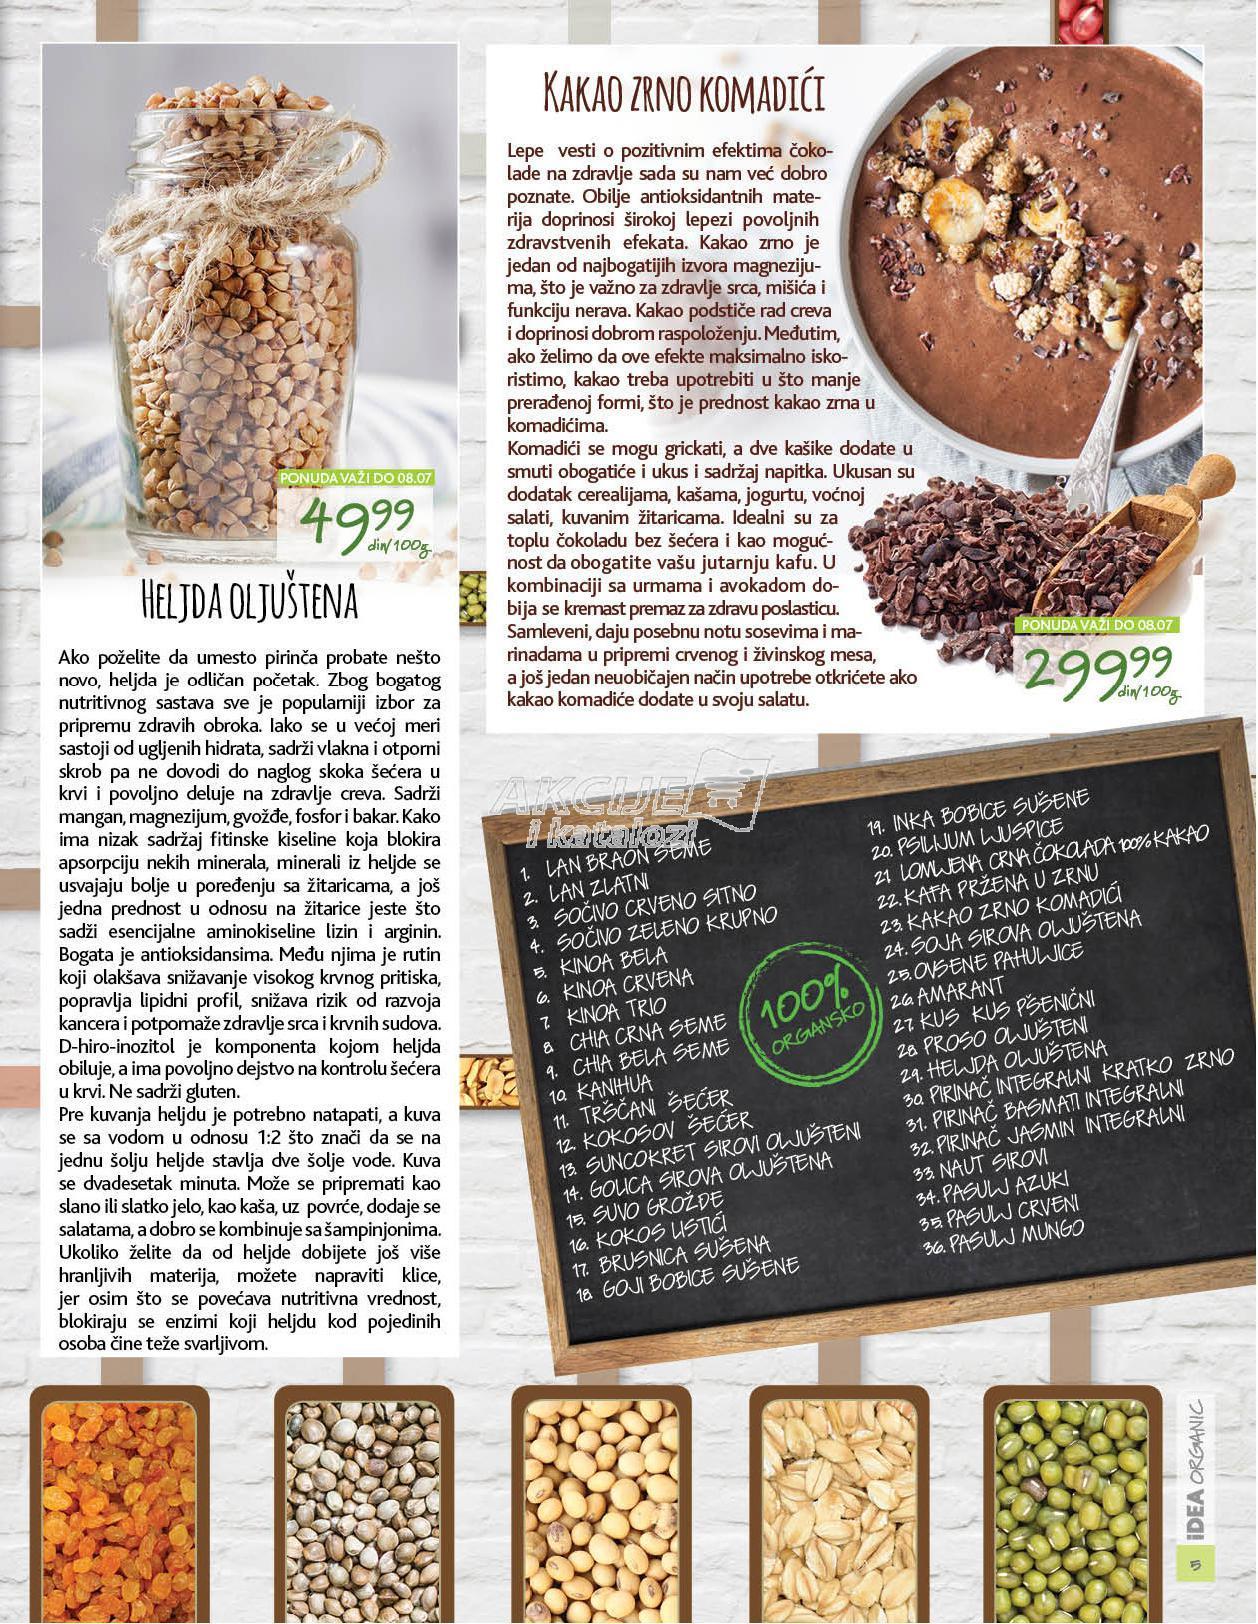 Idea akcija organic proizvodi po super ceni